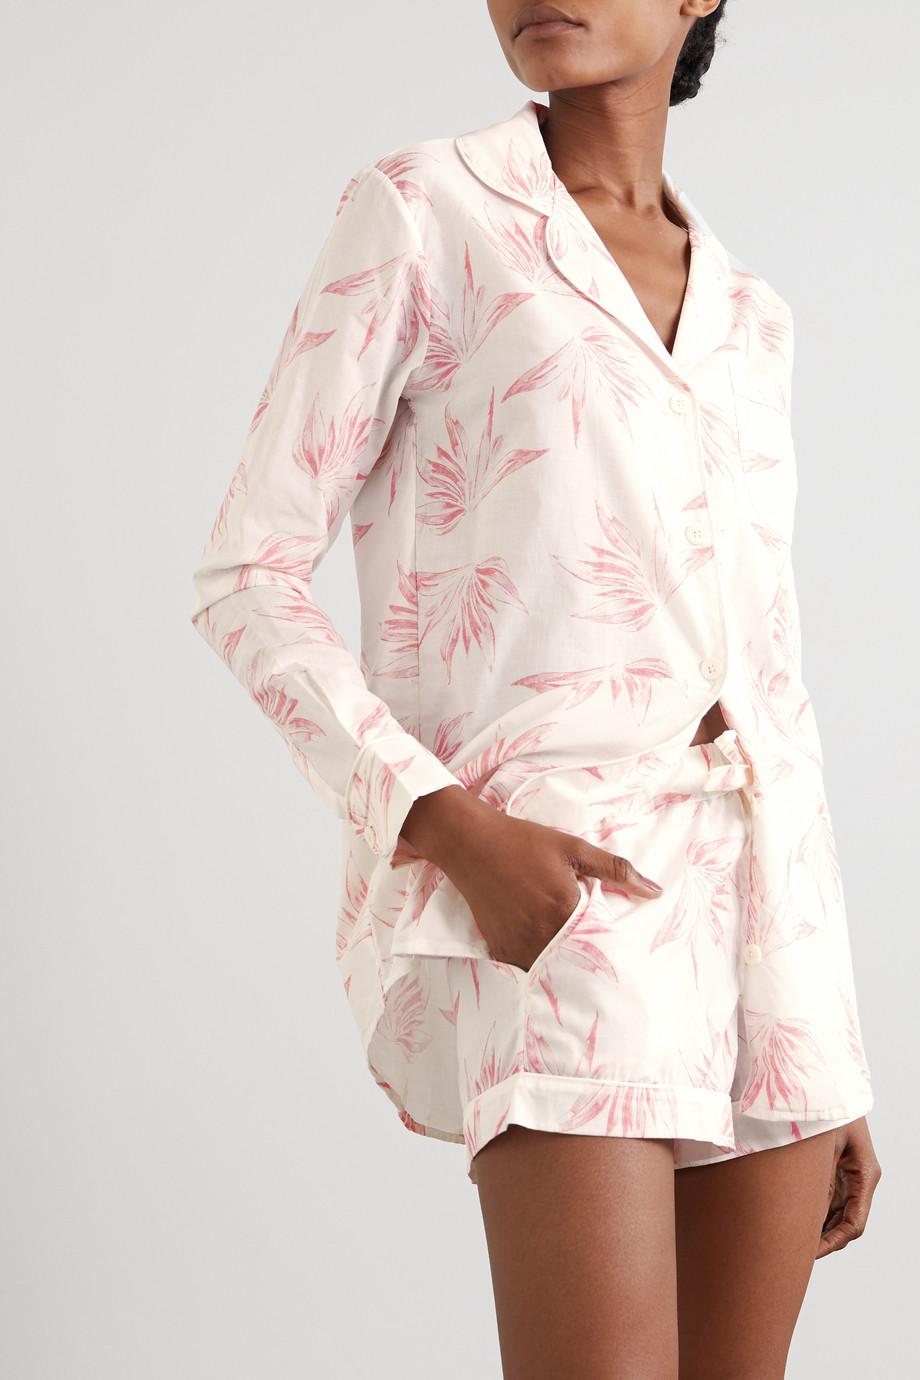 Desmond & Dempsey Deia 印花有机纯棉睡衣套装